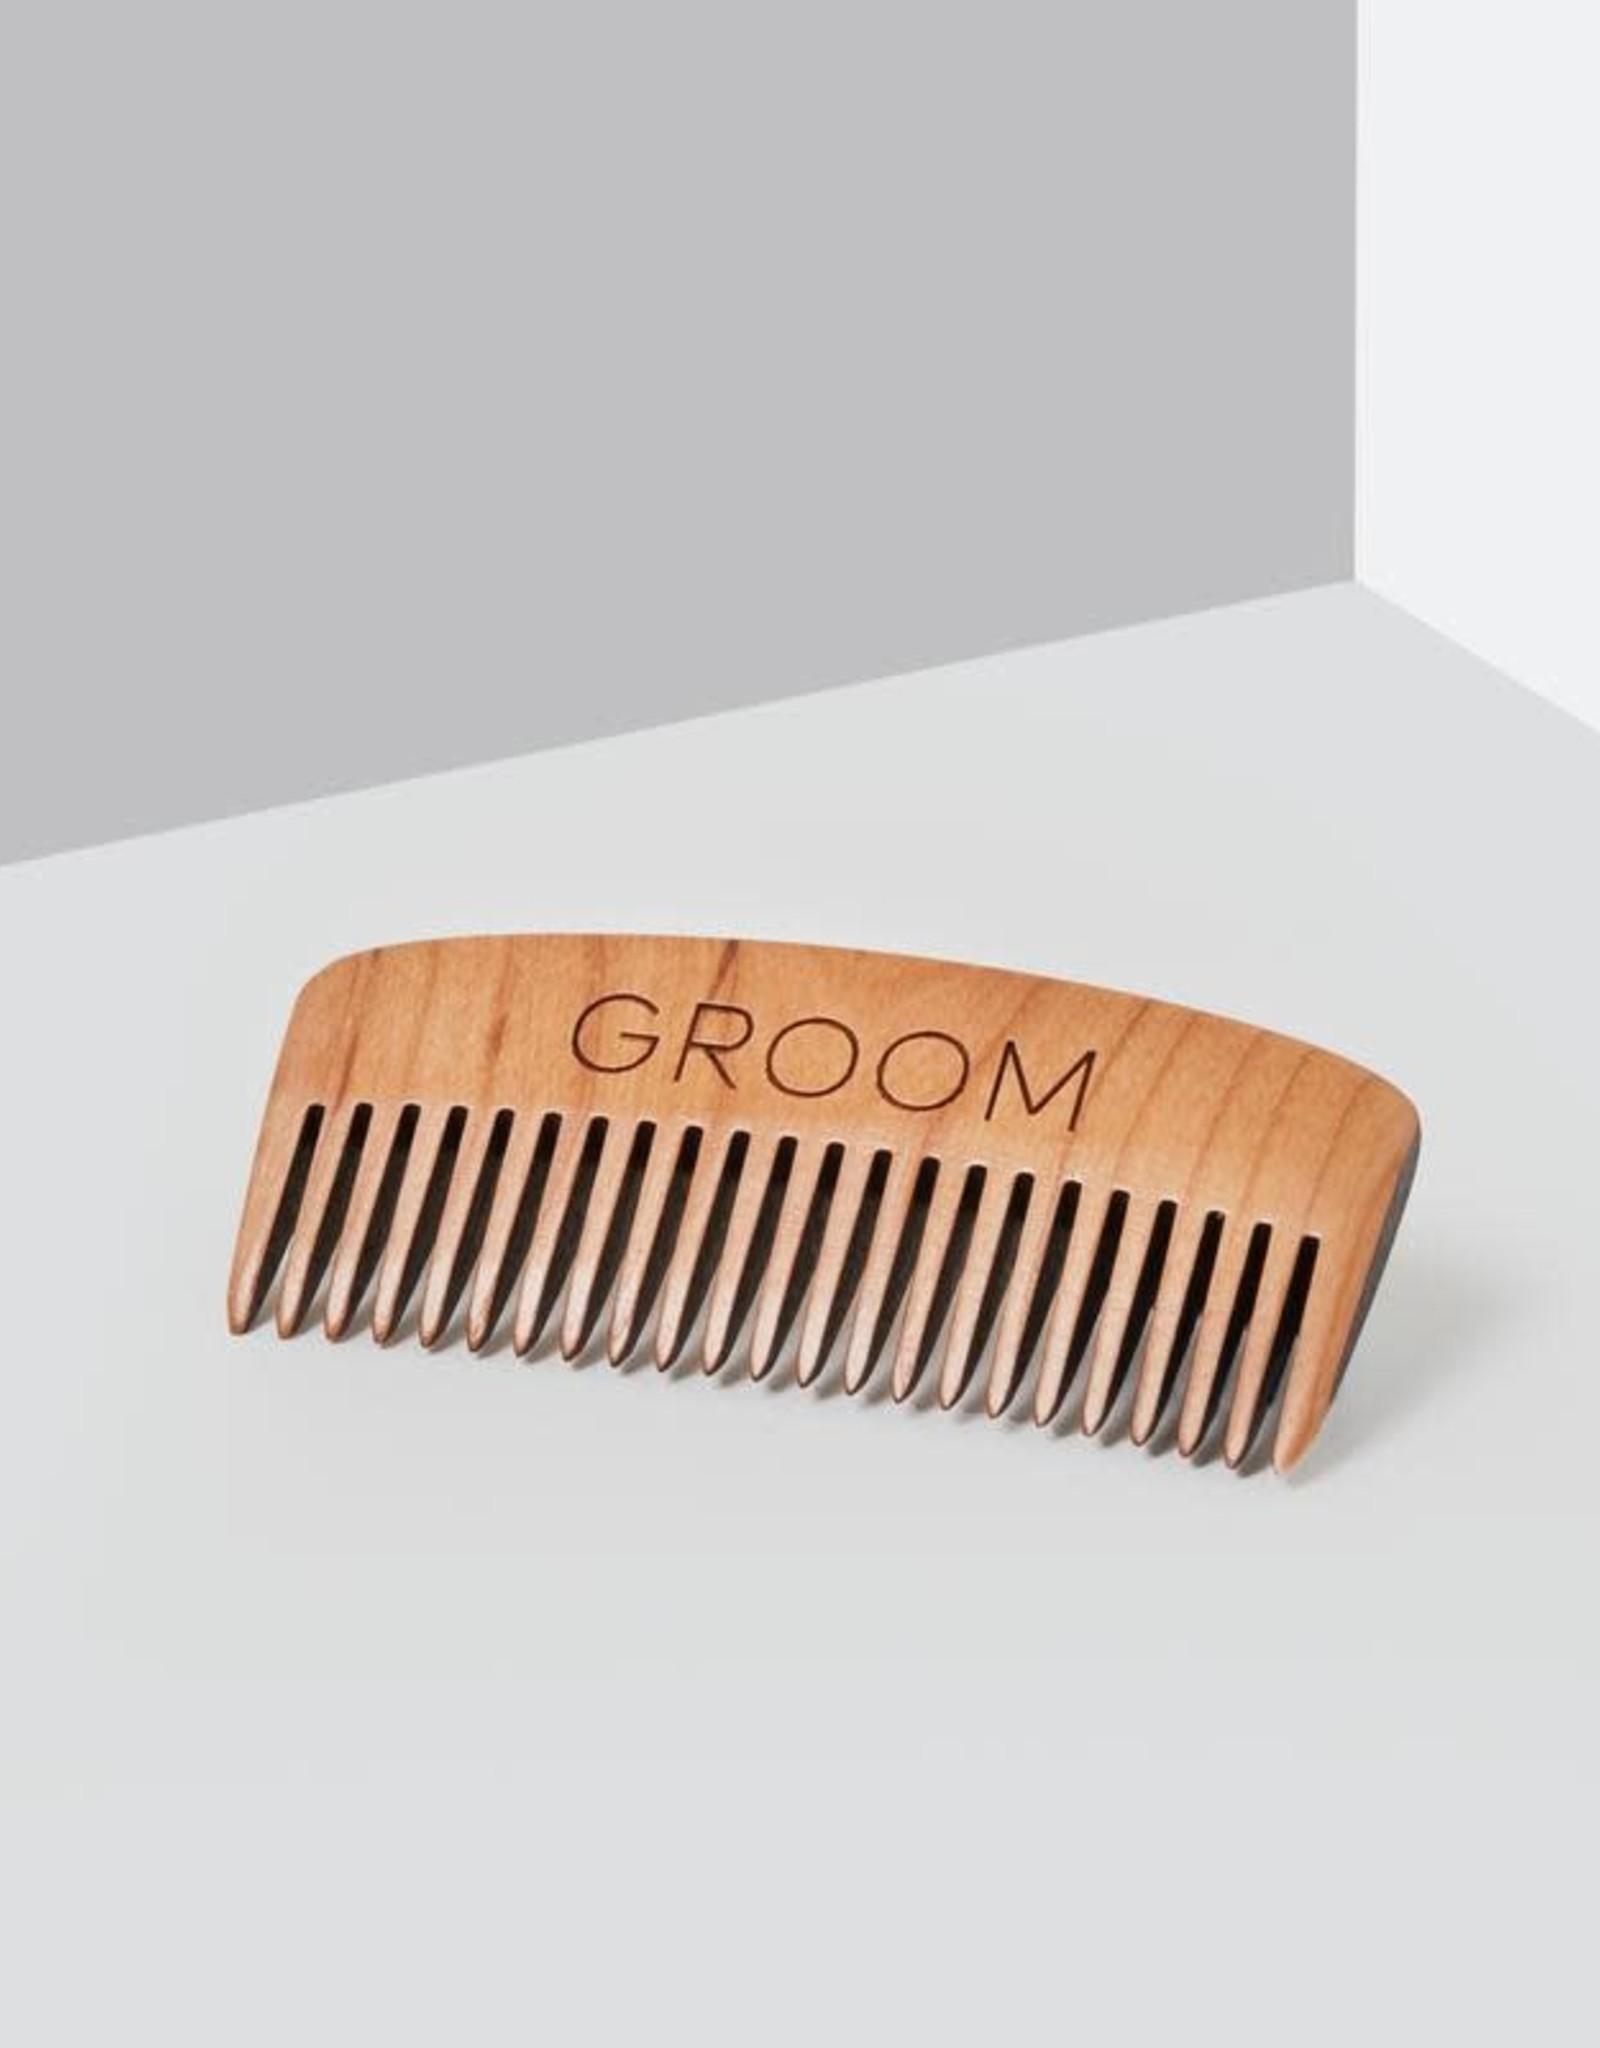 Groom Peigne en bois